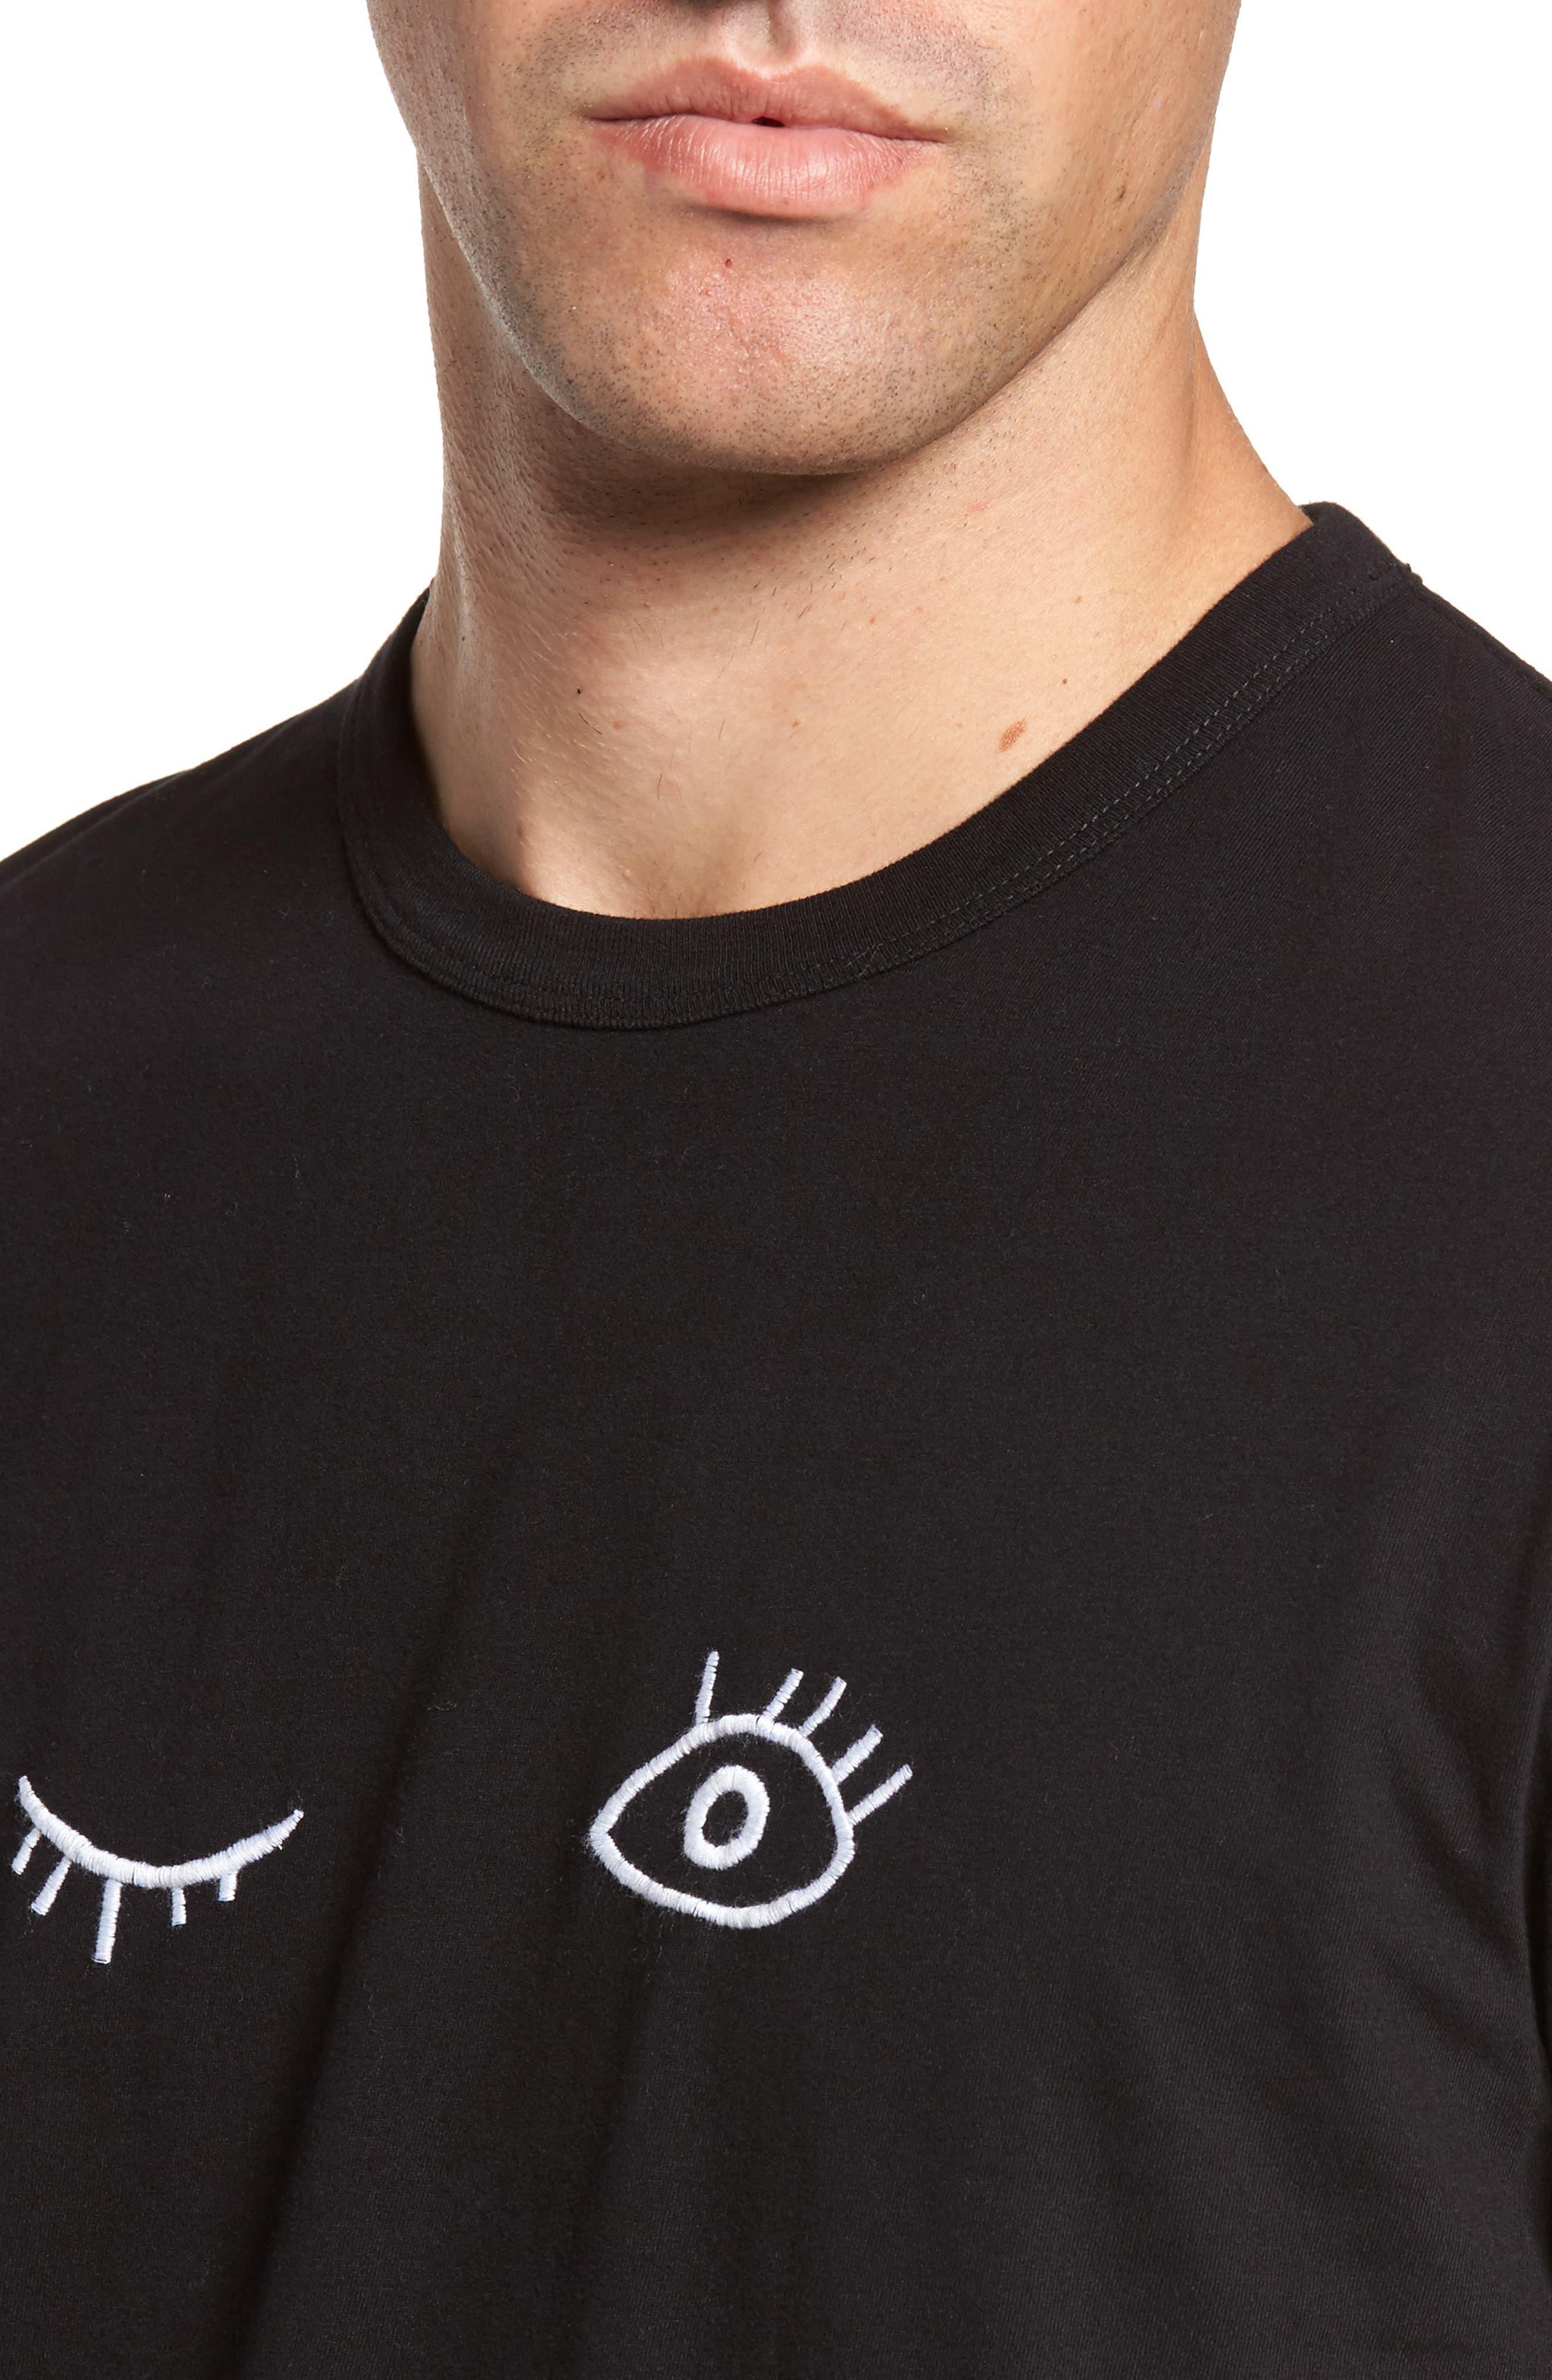 Wink Regular Fit T-Shirt,                             Alternate thumbnail 4, color,                             Black/ White